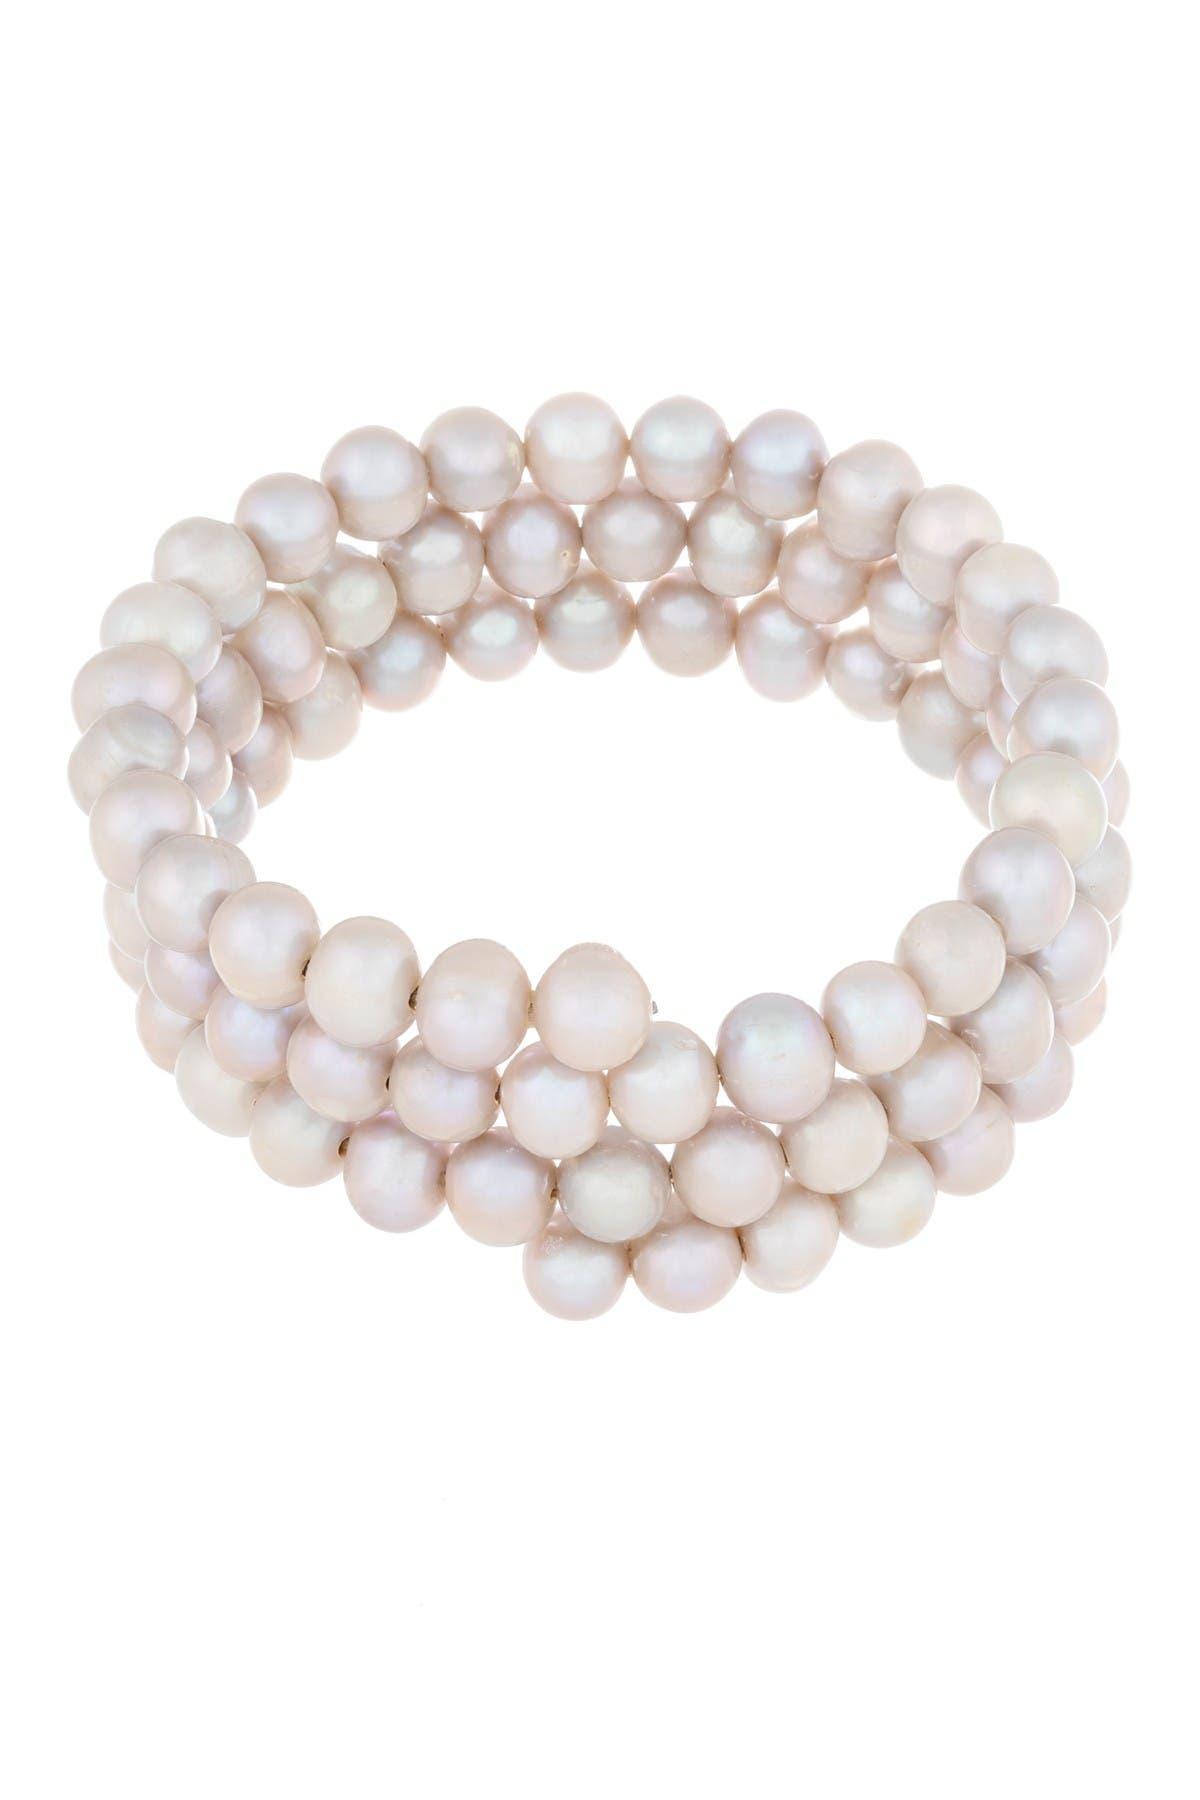 Image of Splendid Pearls 6-7mm Gray Cultured Freshwater Pearl Triple Strand Bangle Bracelet